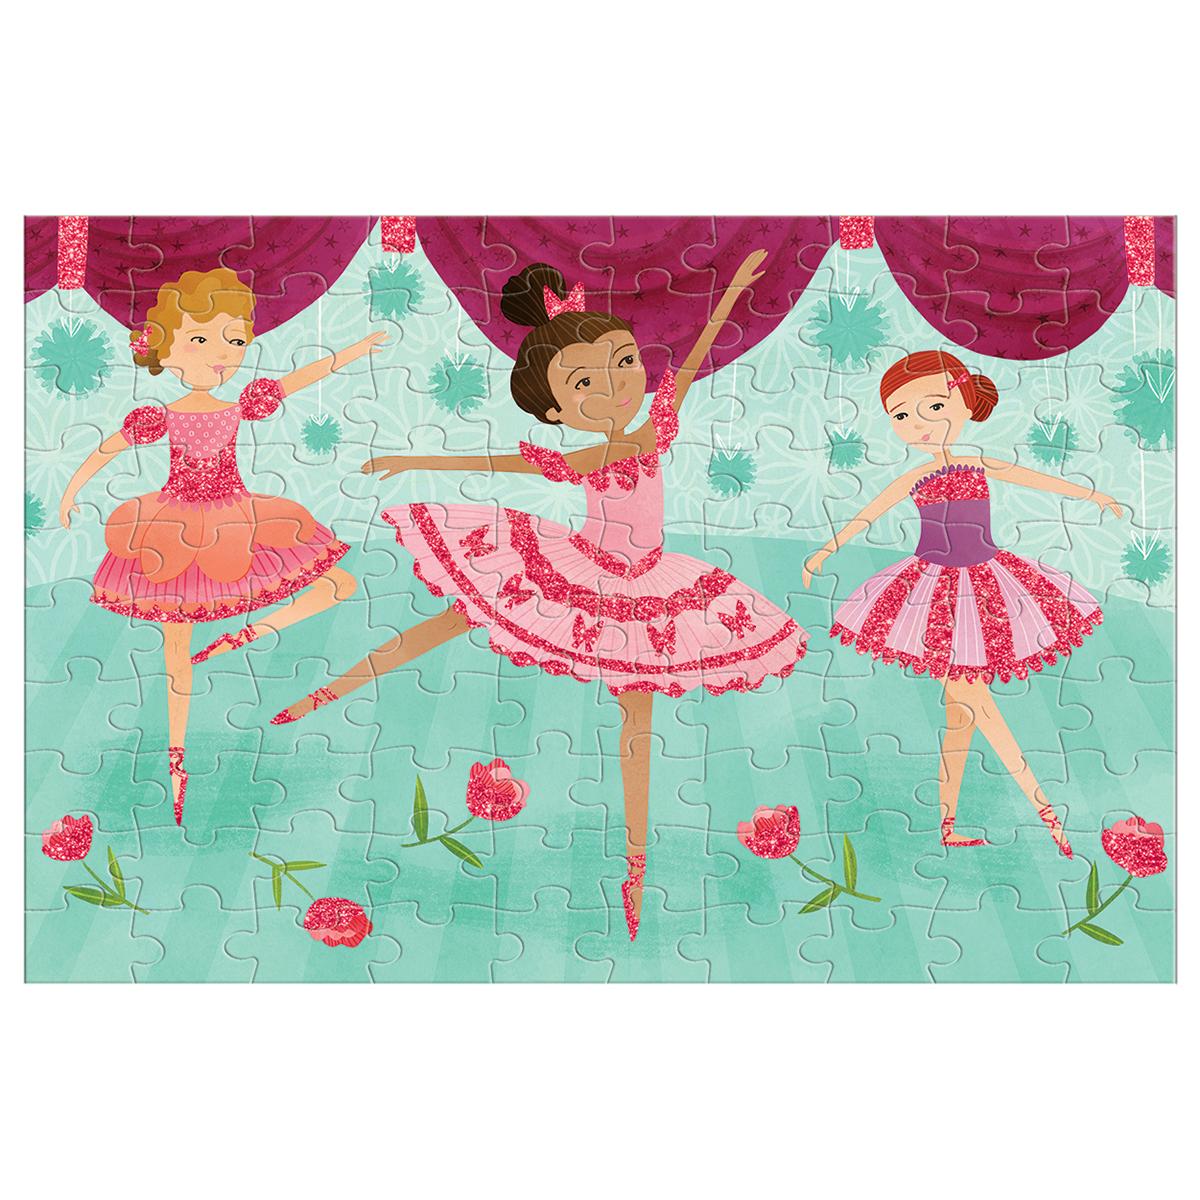 Ballerinas Glitter Princess Glitter / Shimmer / Foil Puzzles